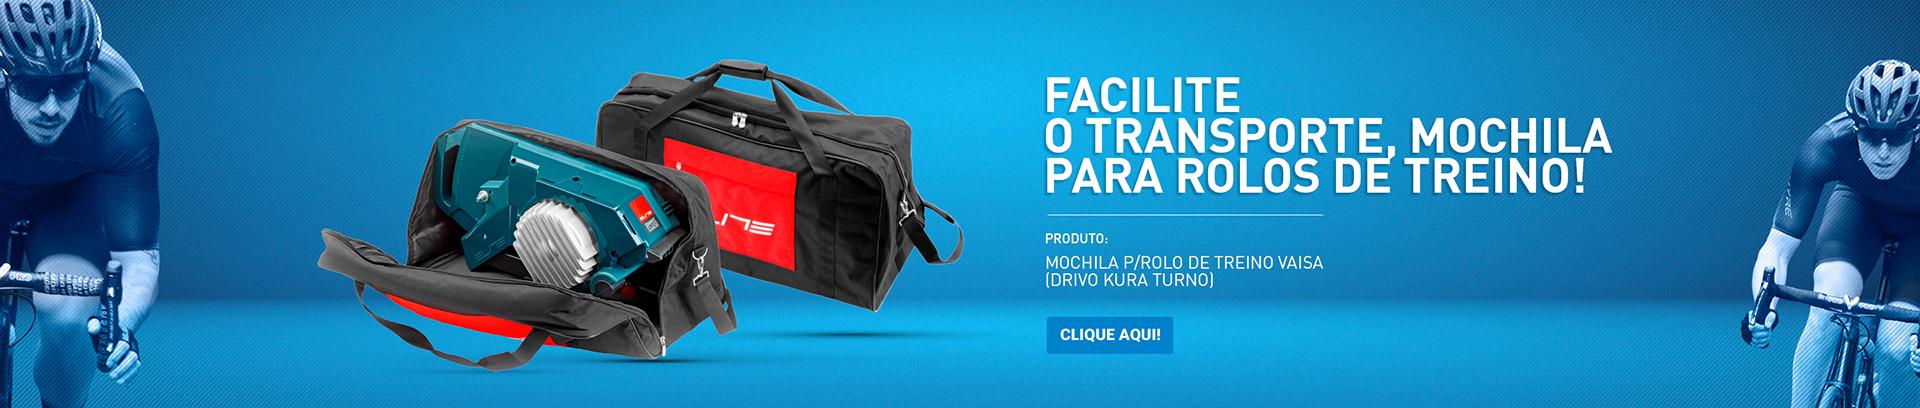 MOCHILA P/ROLO DE TREINO VAISA